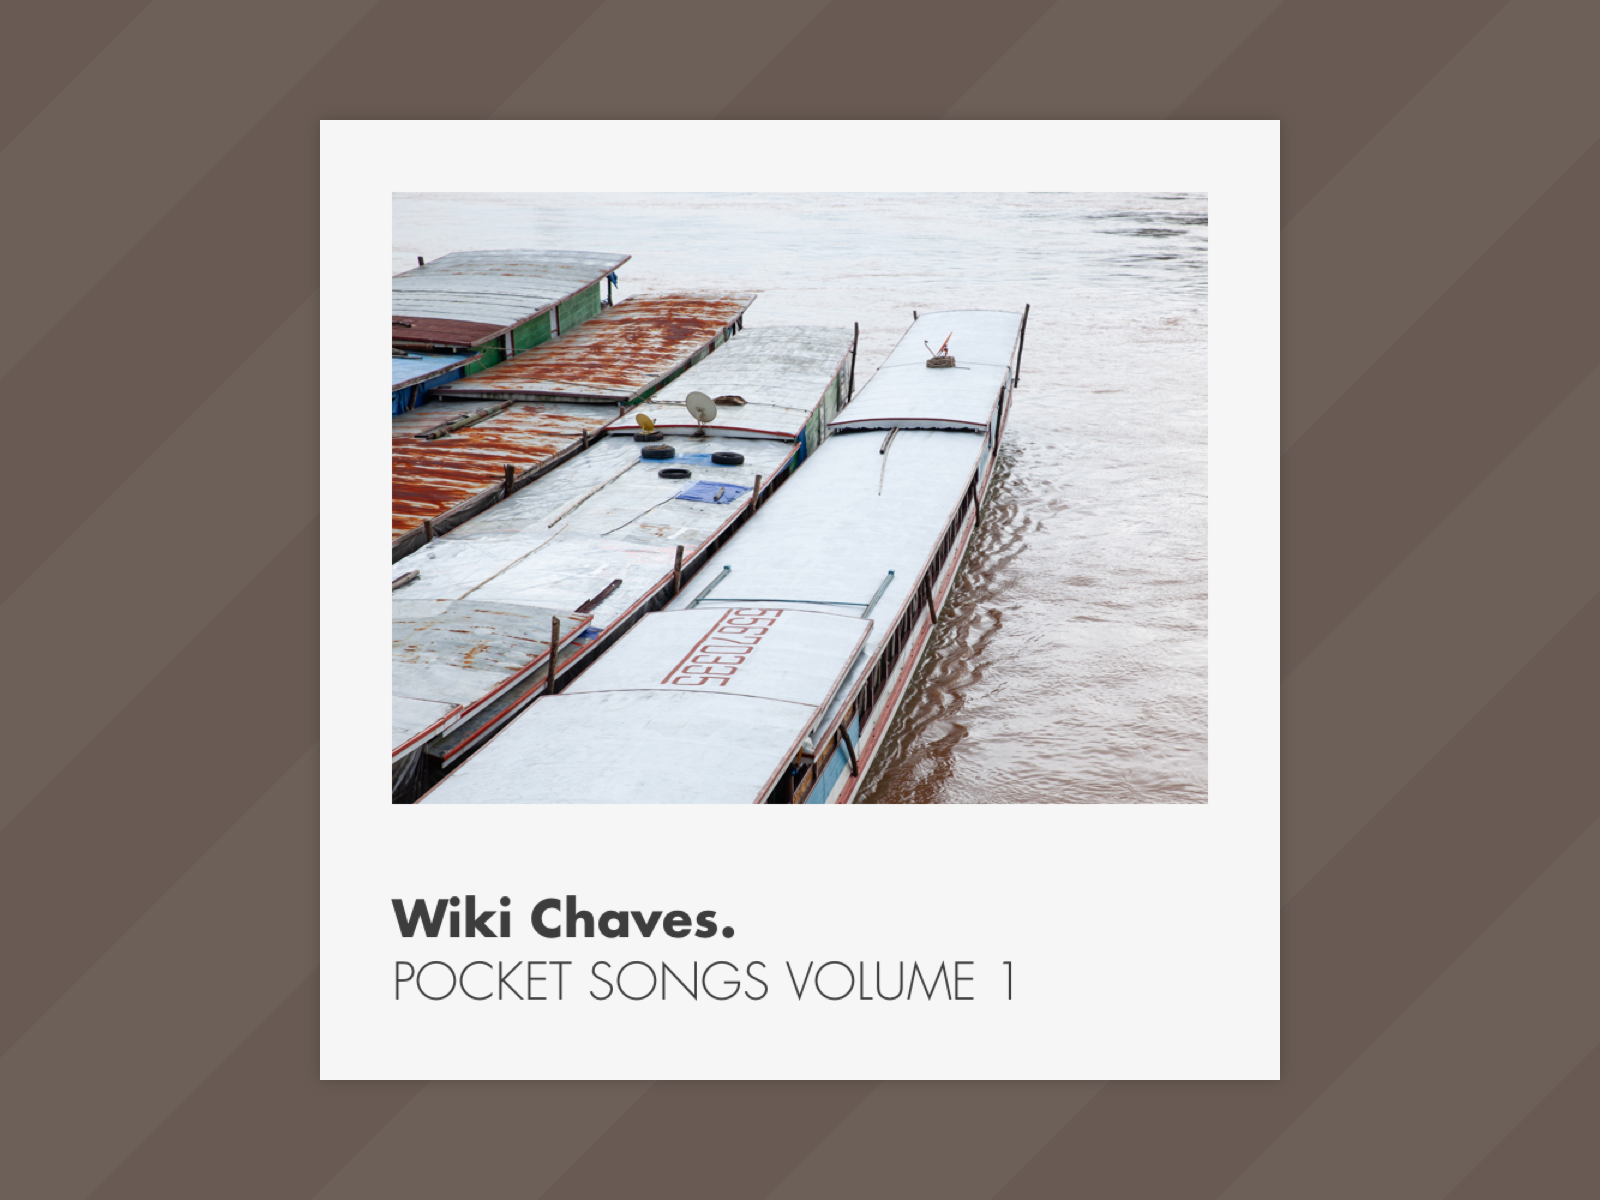 Pocket songs volume 1 4x